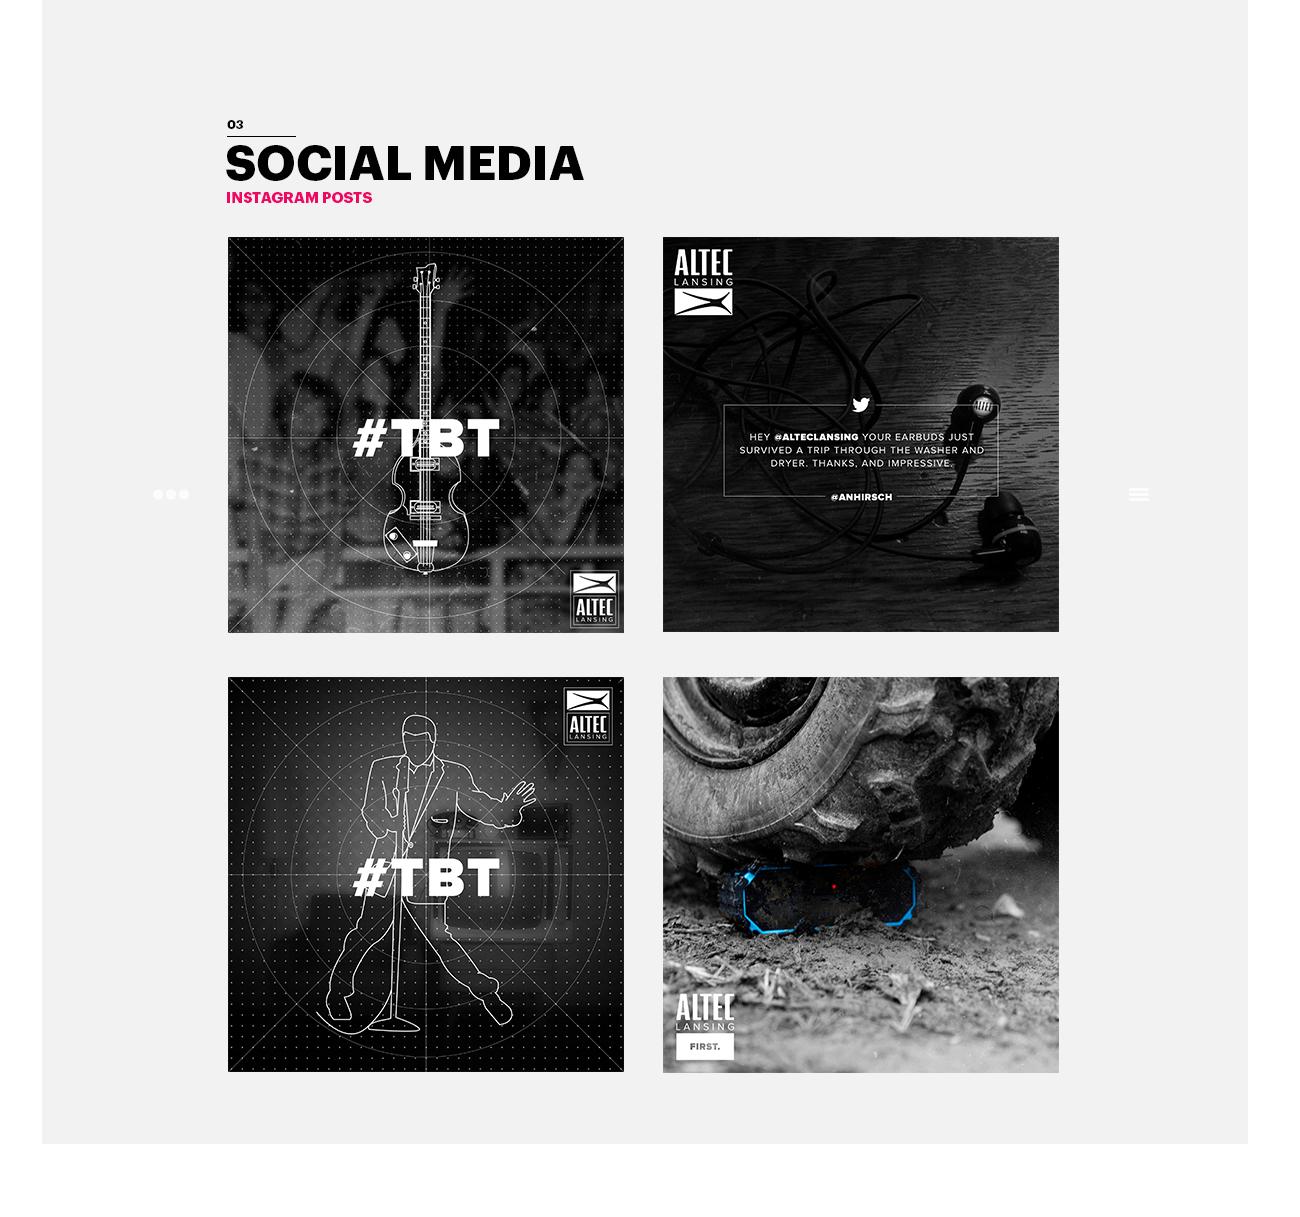 Altec Social Media Design